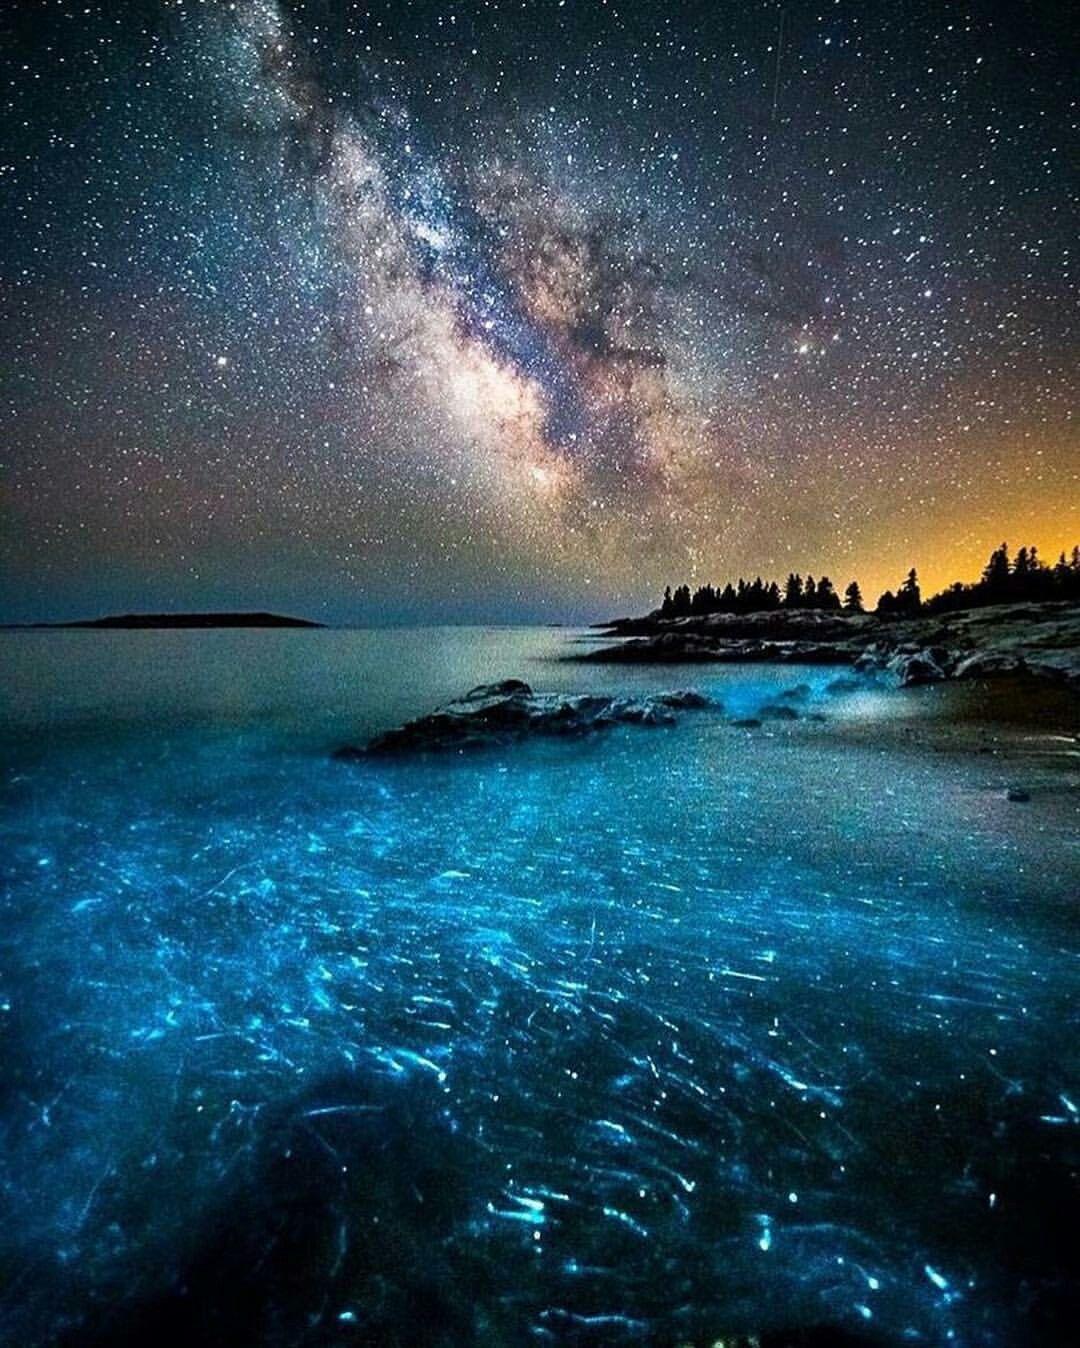 Milky Way Over Bioluminescent Ocean Nature Photography Maine Photography Beautiful Photography Nature